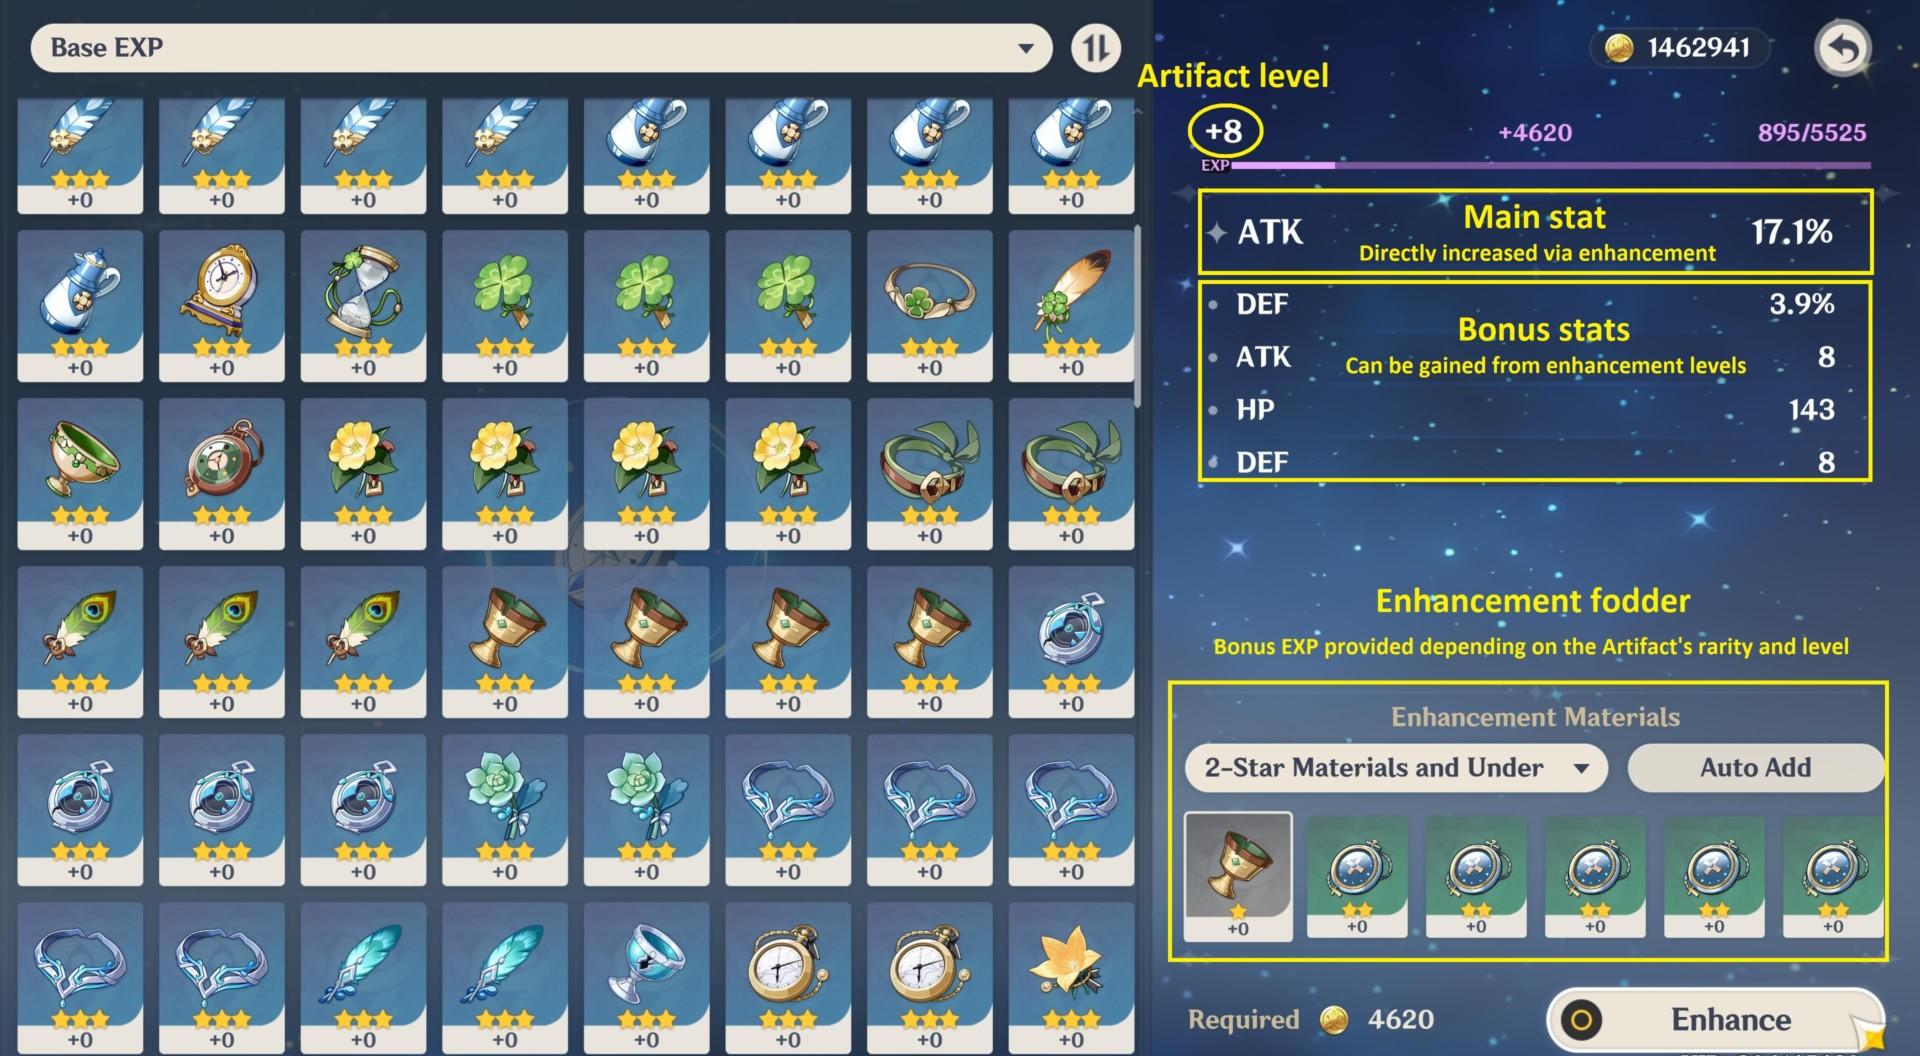 Genshin Impact: The best Artifact sets to increase damage